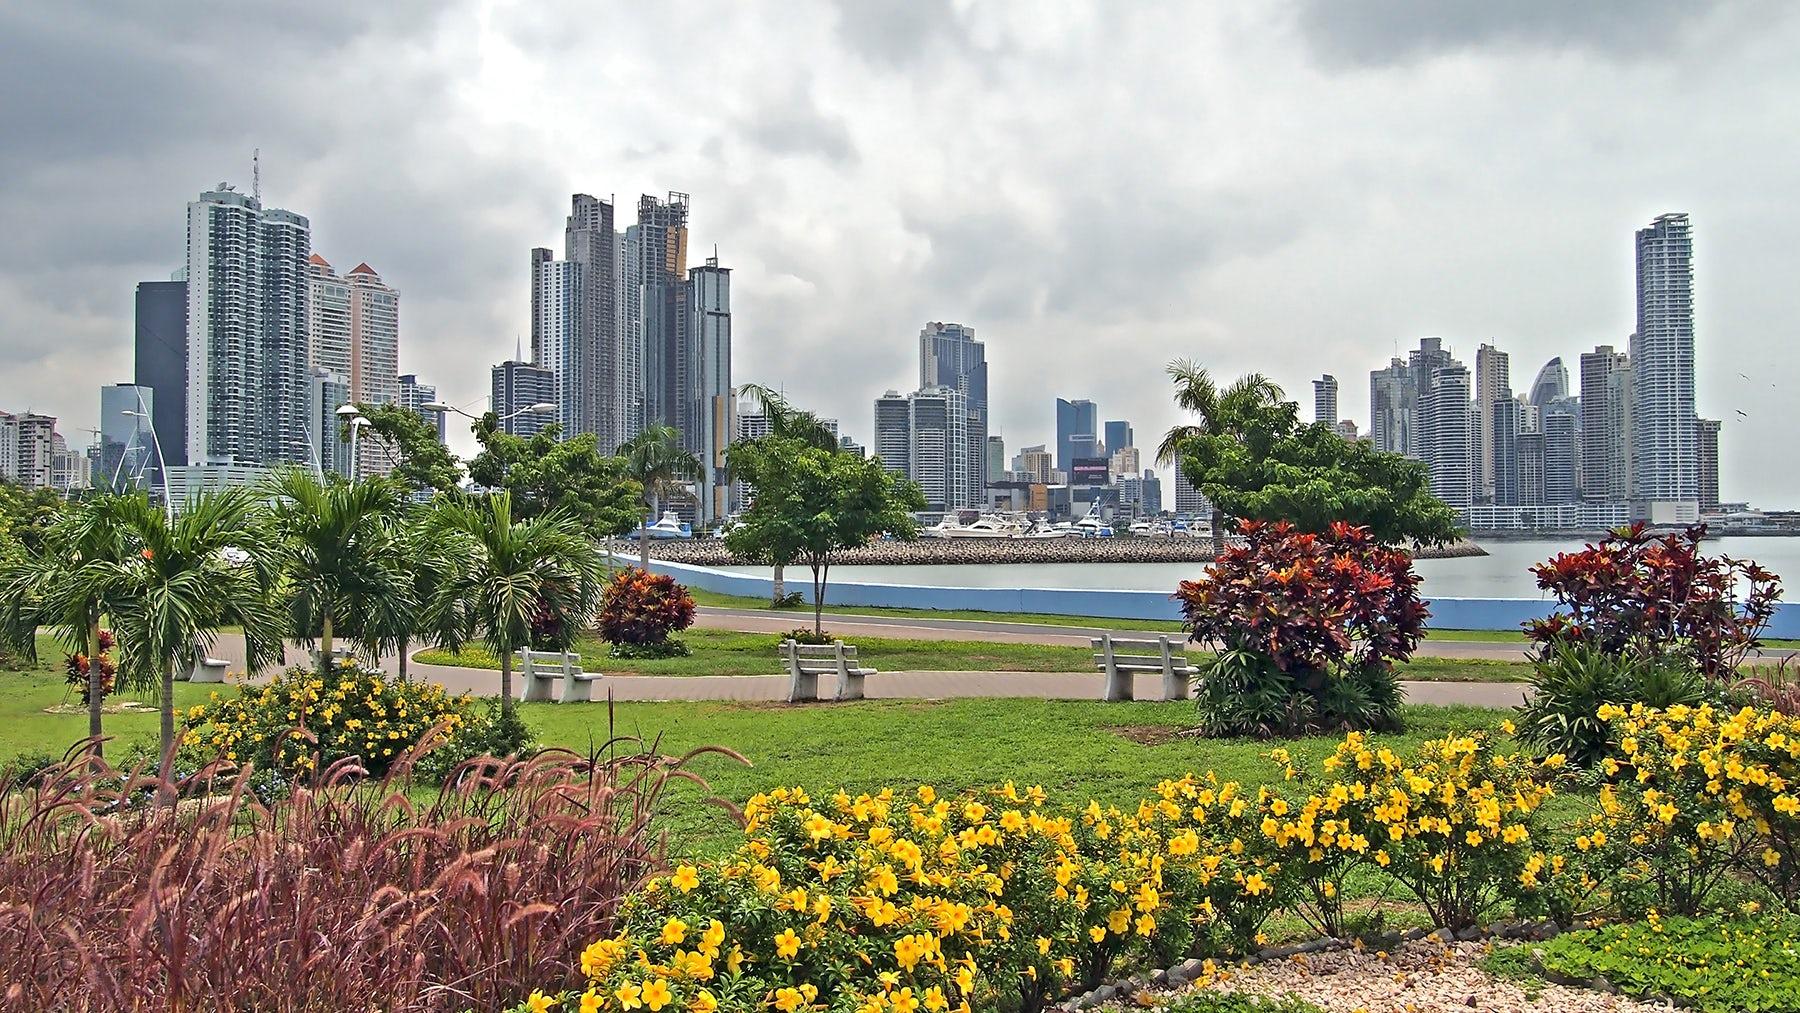 Panama City | Source: Shutterstock